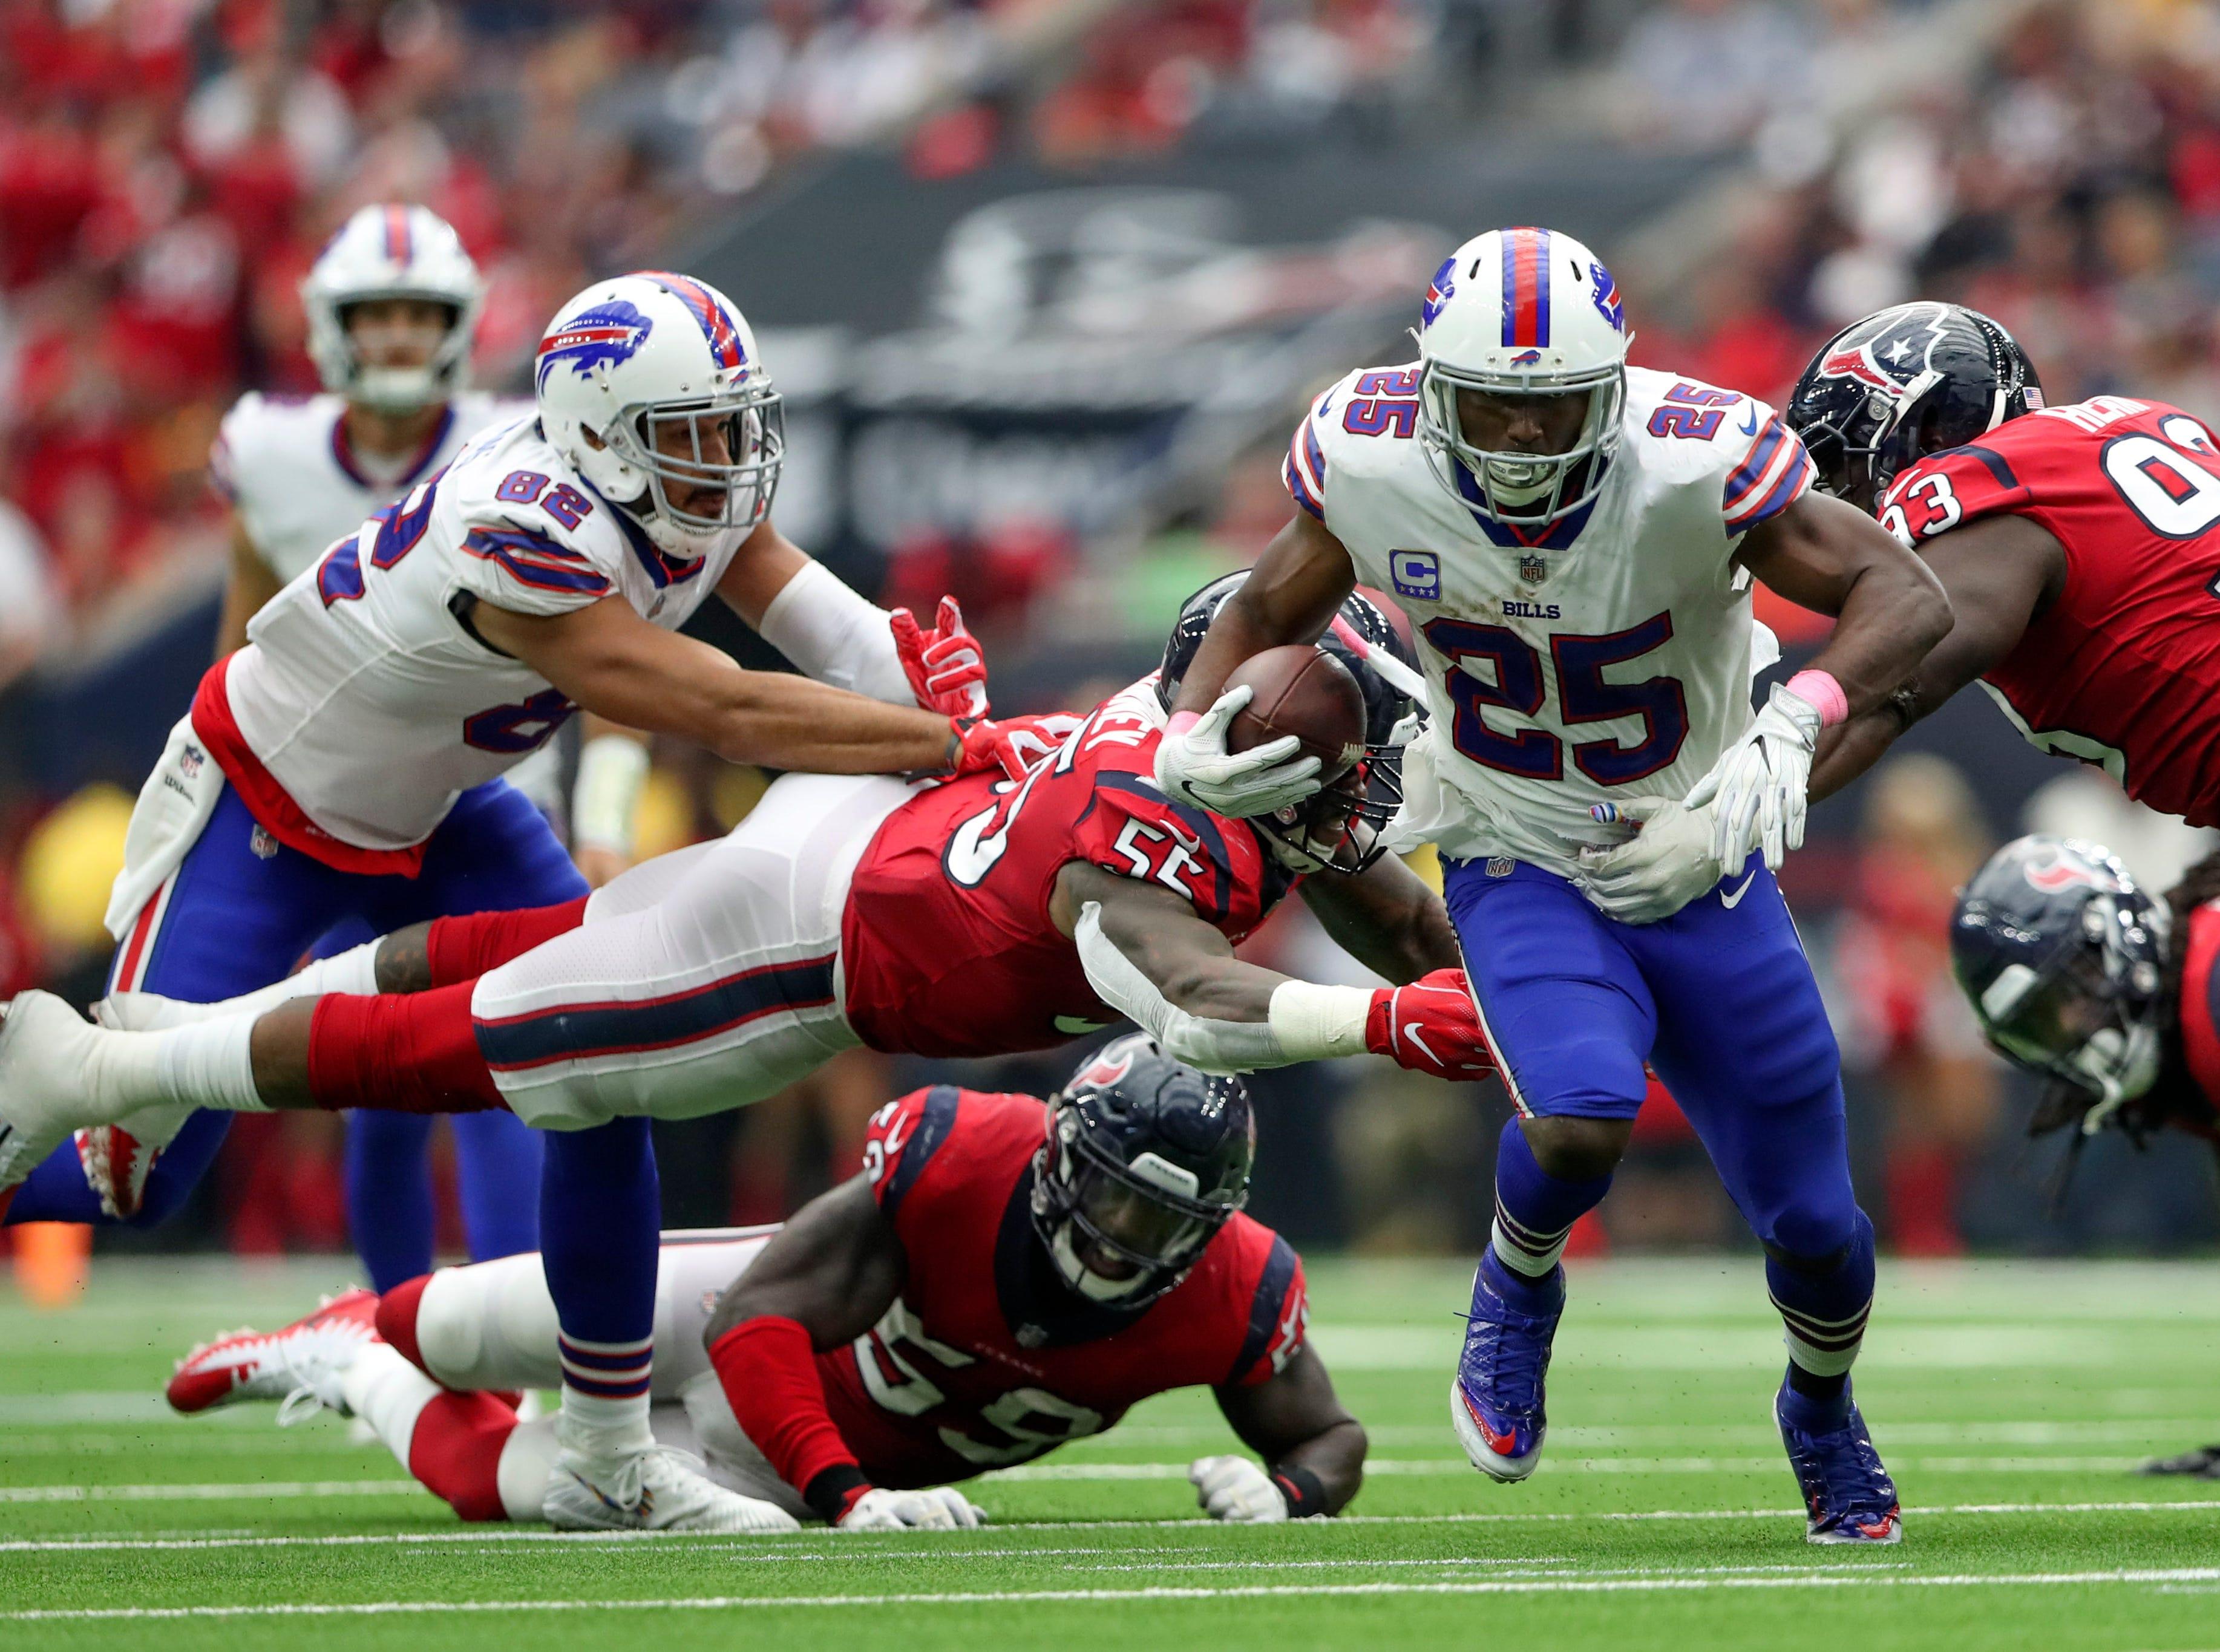 Oct 14, 2018; Houston, TX, USA; Buffalo Bills running back LeSean McCoy (25) runs as Houston Texans linebacker Benardrick McKinney (55) and linebacker Whitney Mercilus (59) defend during the second half at NRG Stadium. Mandatory Credit: Kevin Jairaj-USA TODAY Sports